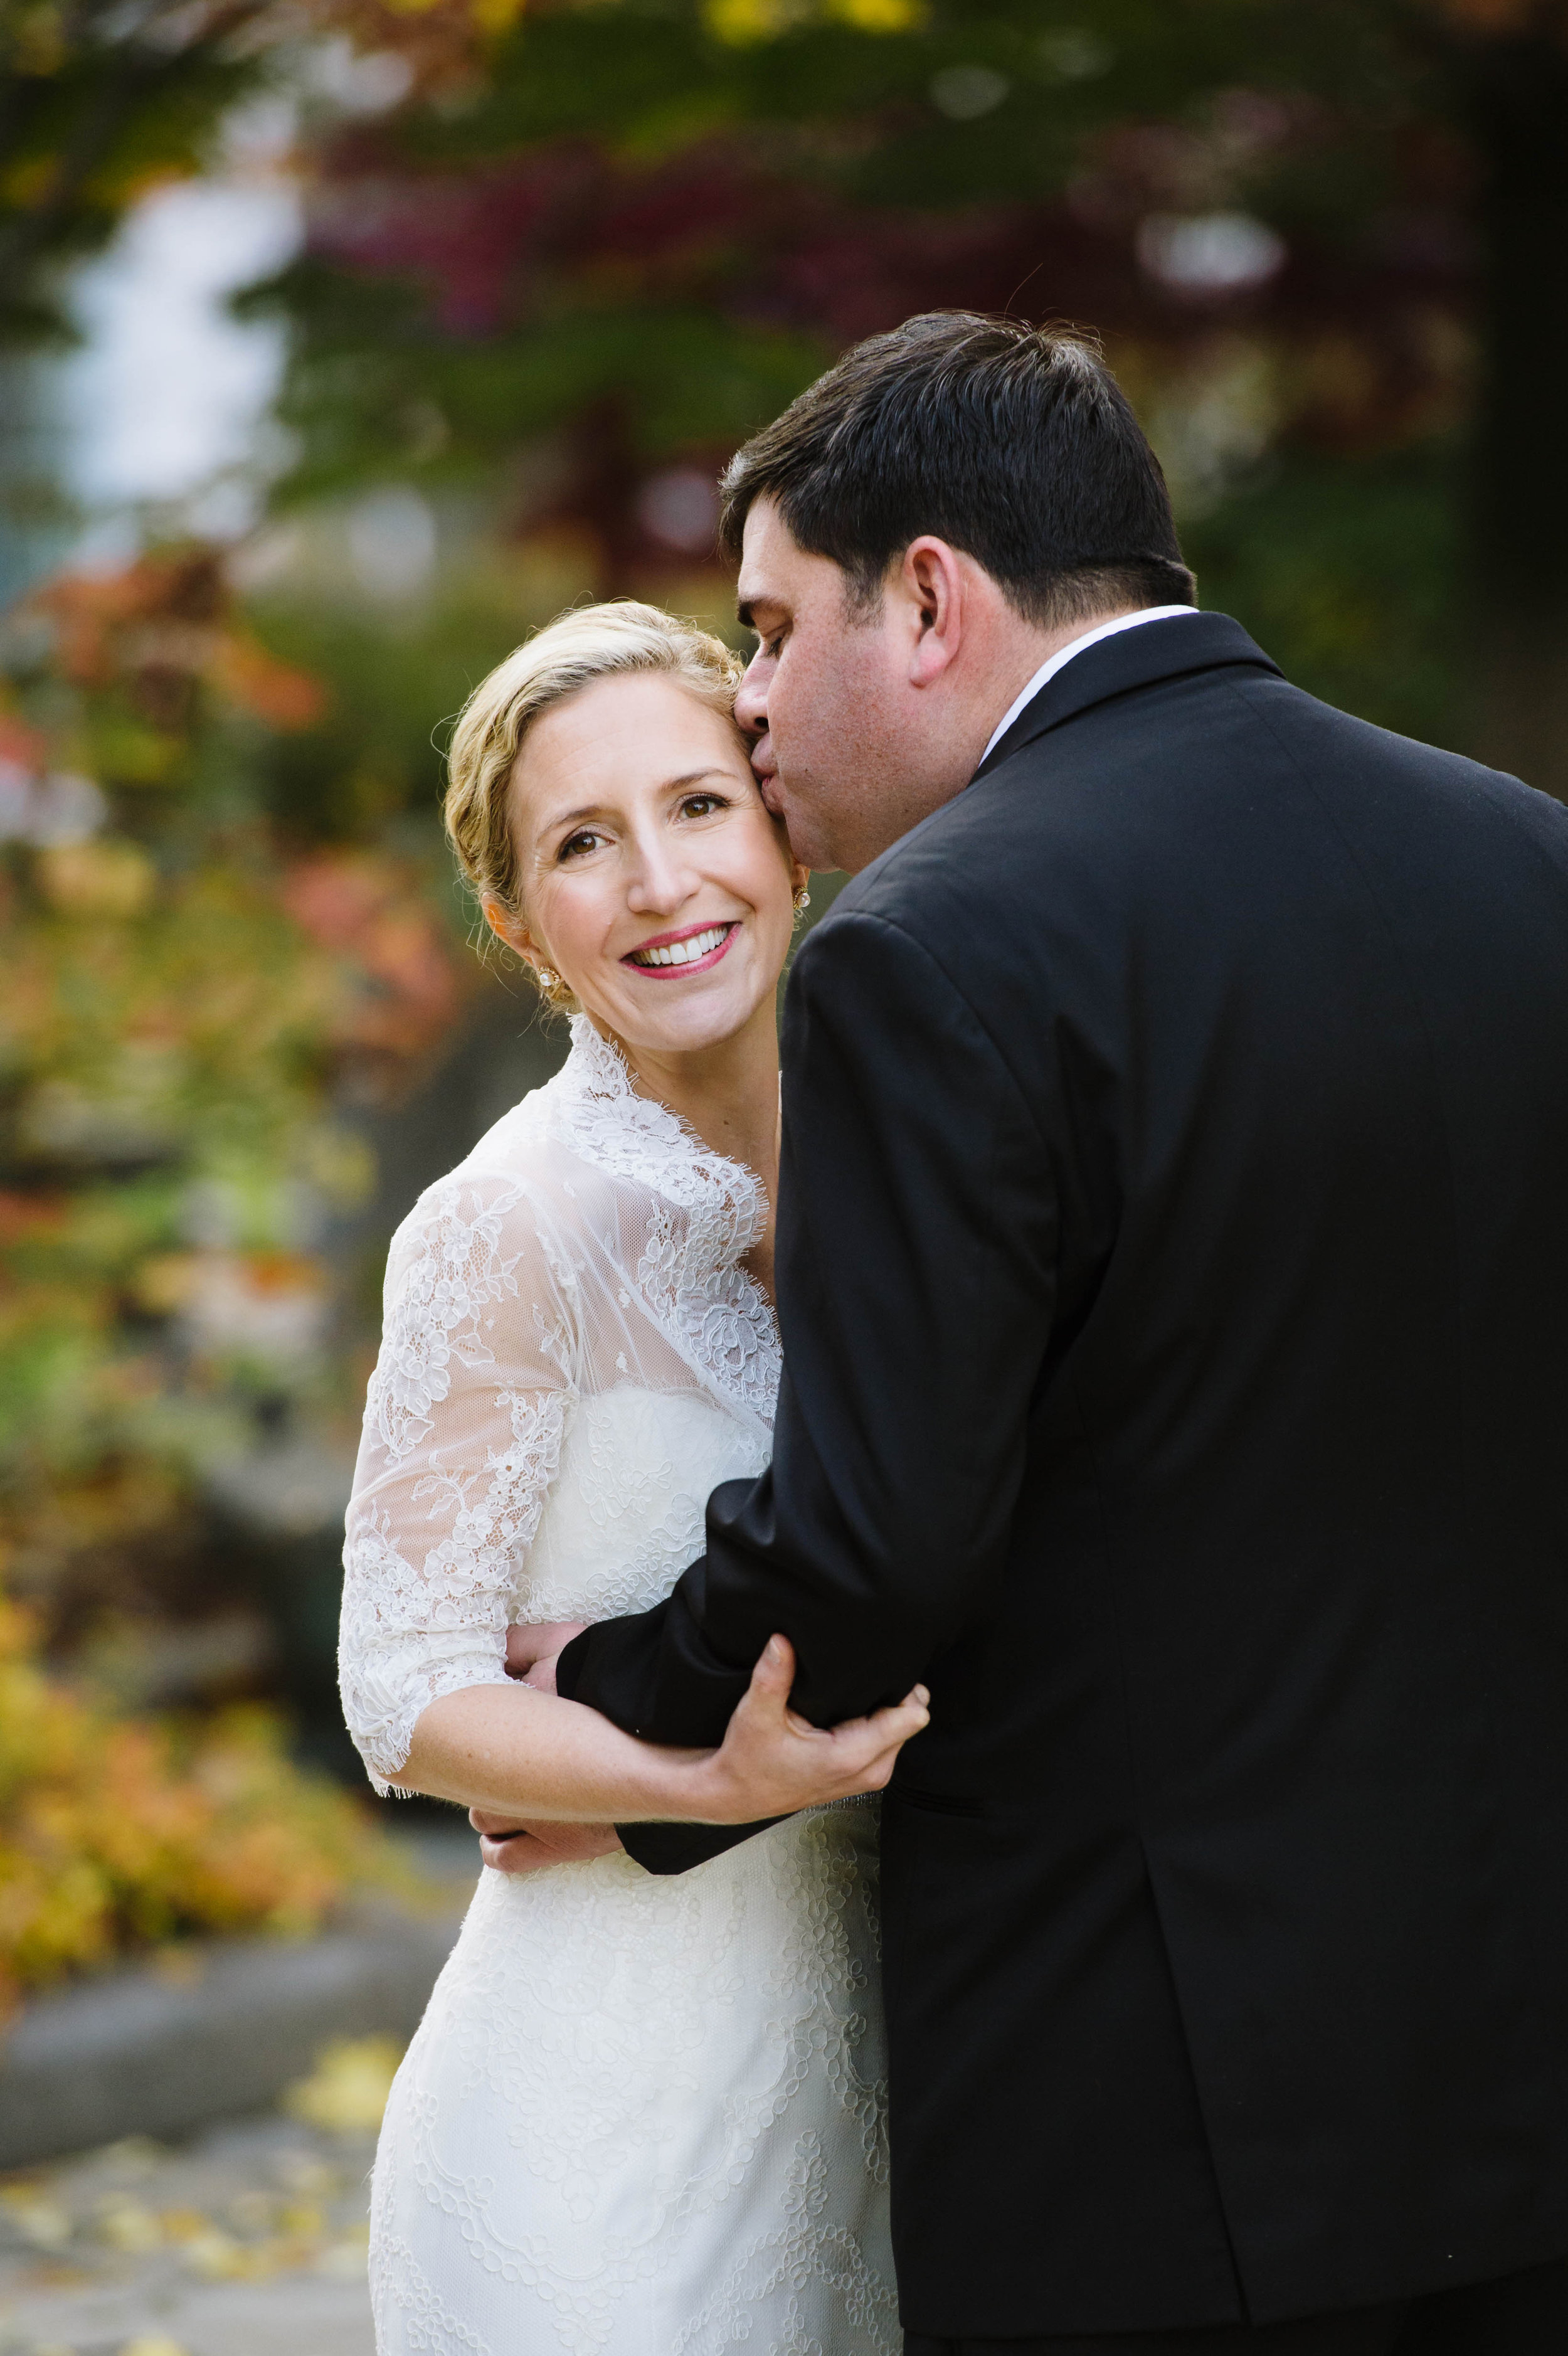 Emotional-Wedding-Photography-Boston14.jpg